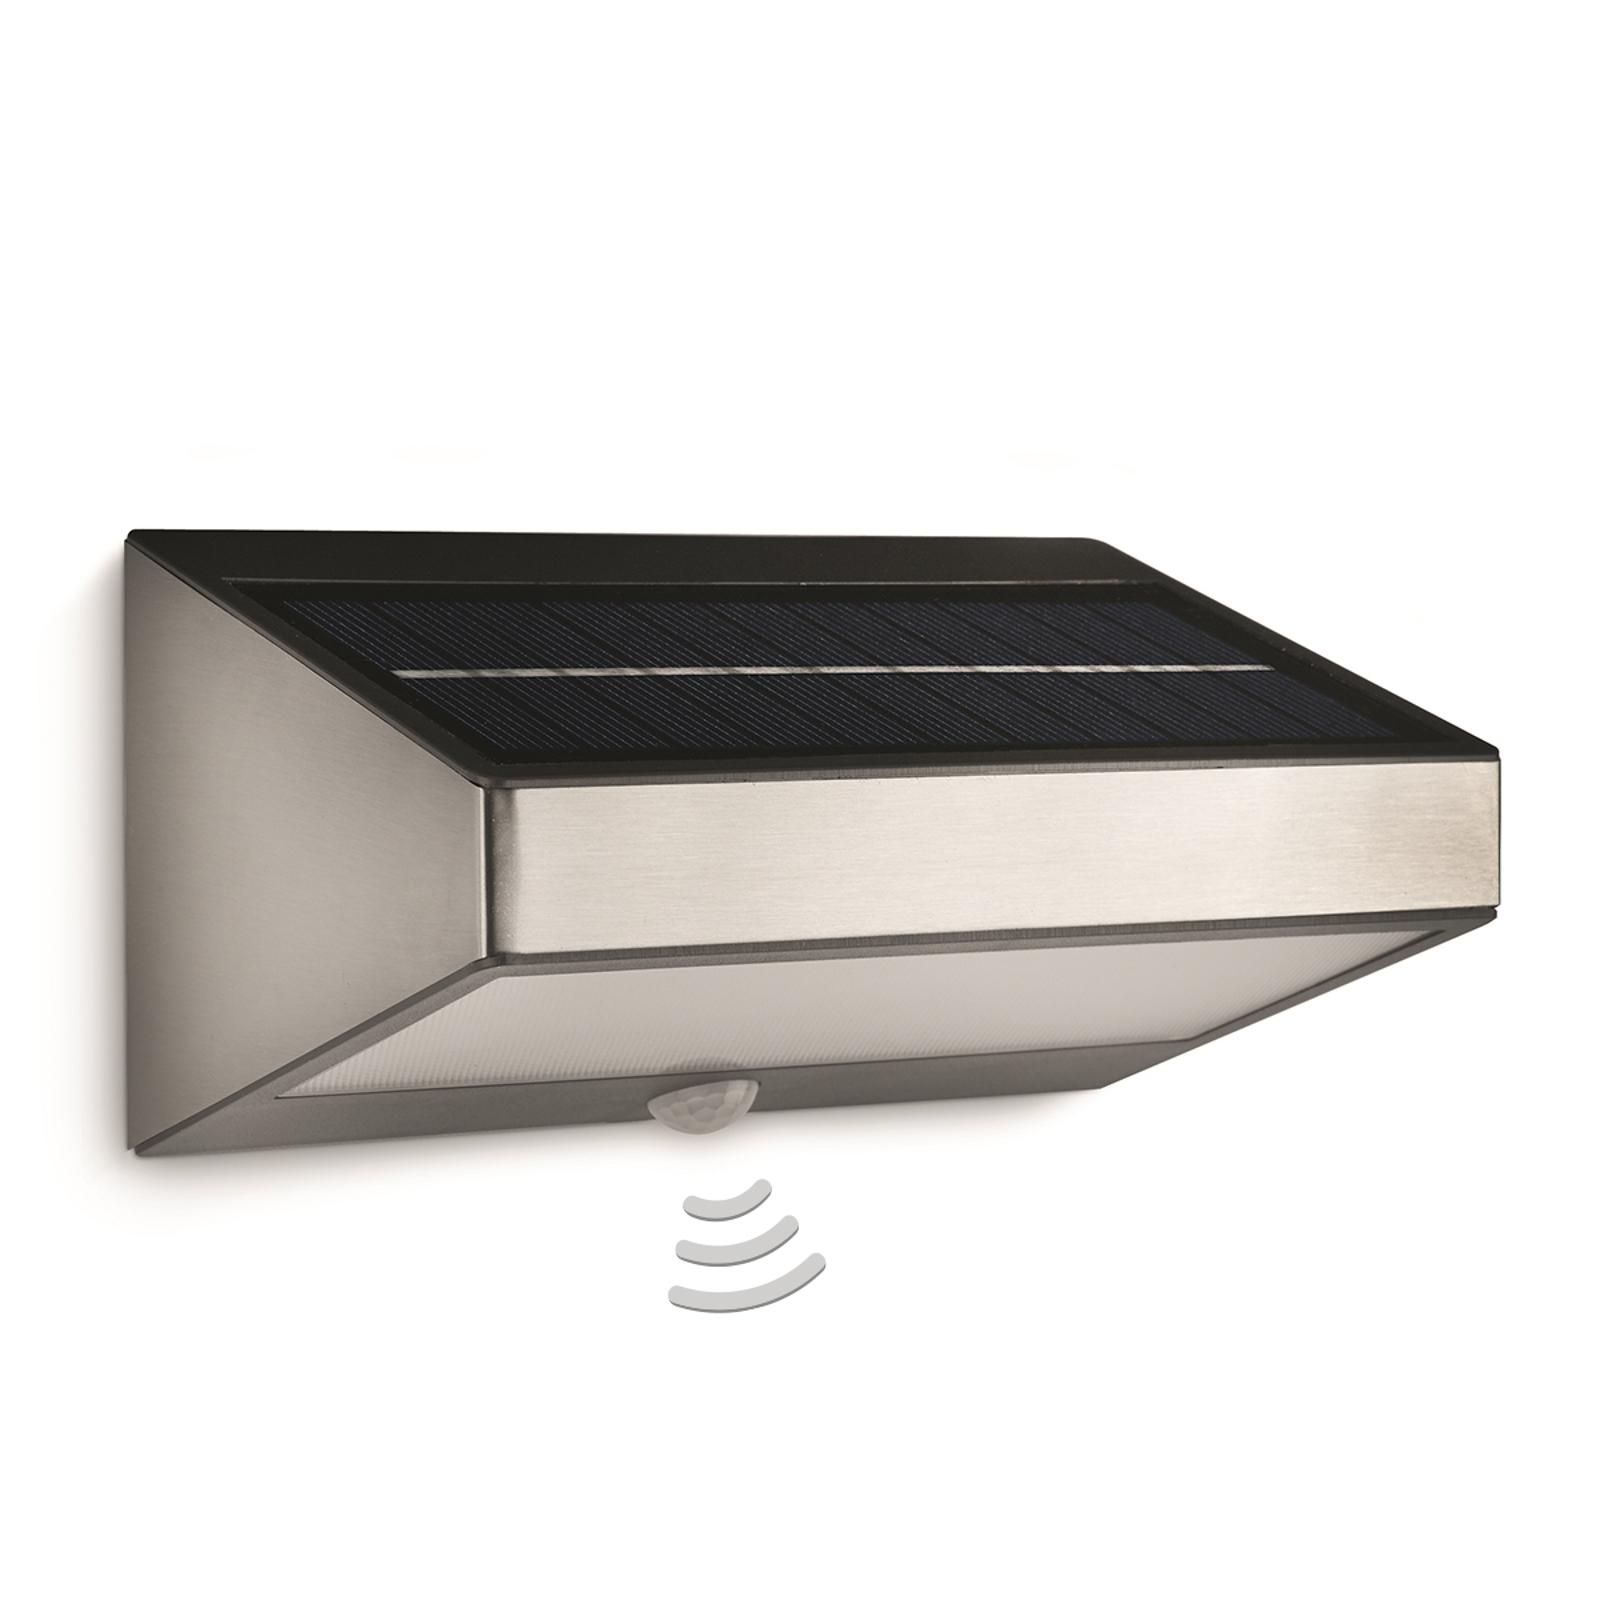 Solar wandlamp GREENHOUSE met bewegingssensor